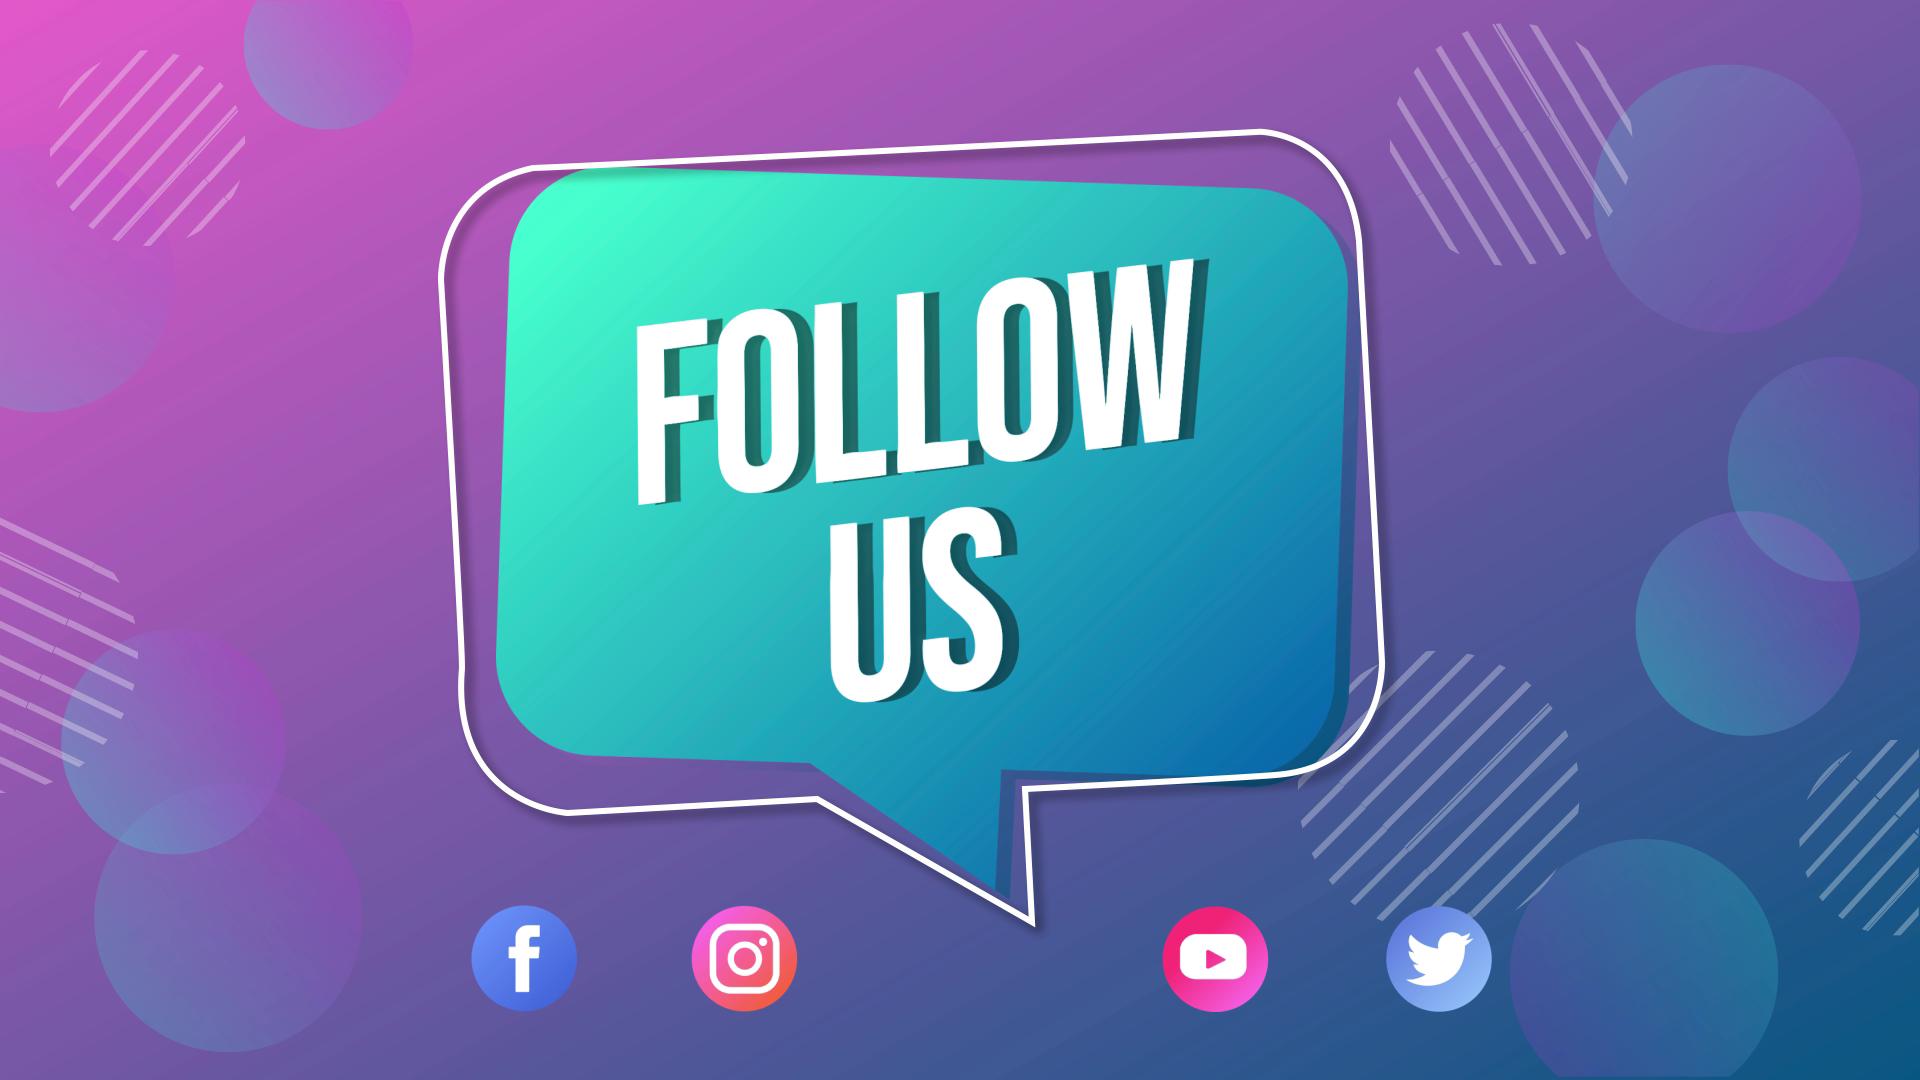 Follow Us Animation